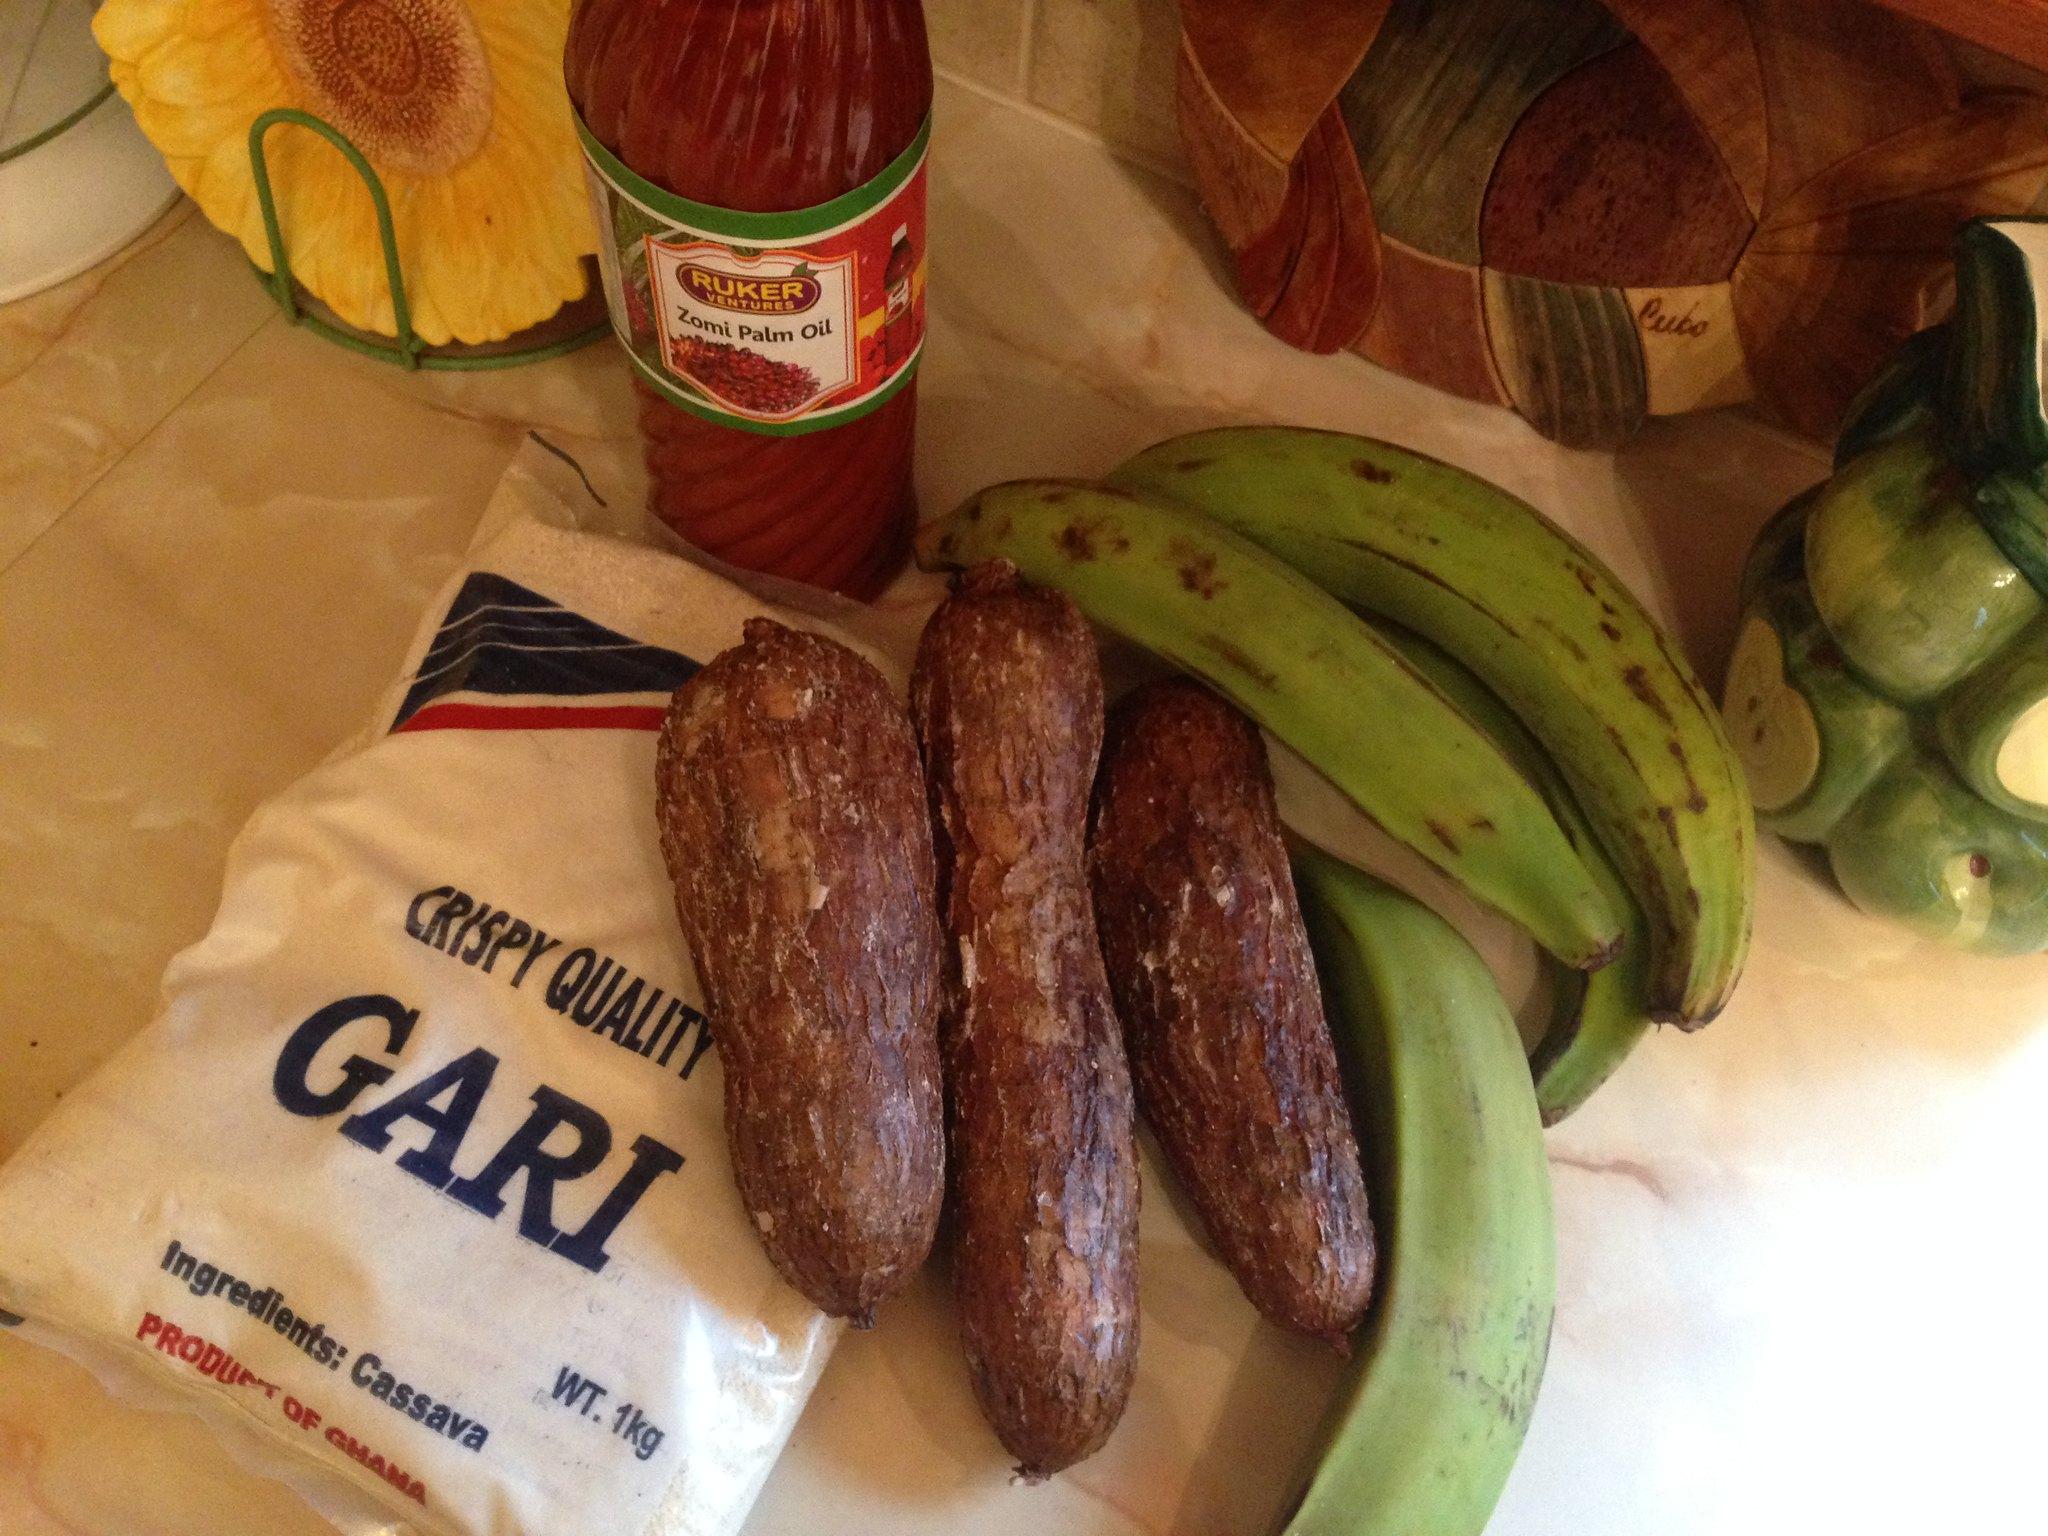 Cassava, green bananas, crispy cassava flour, palm oil